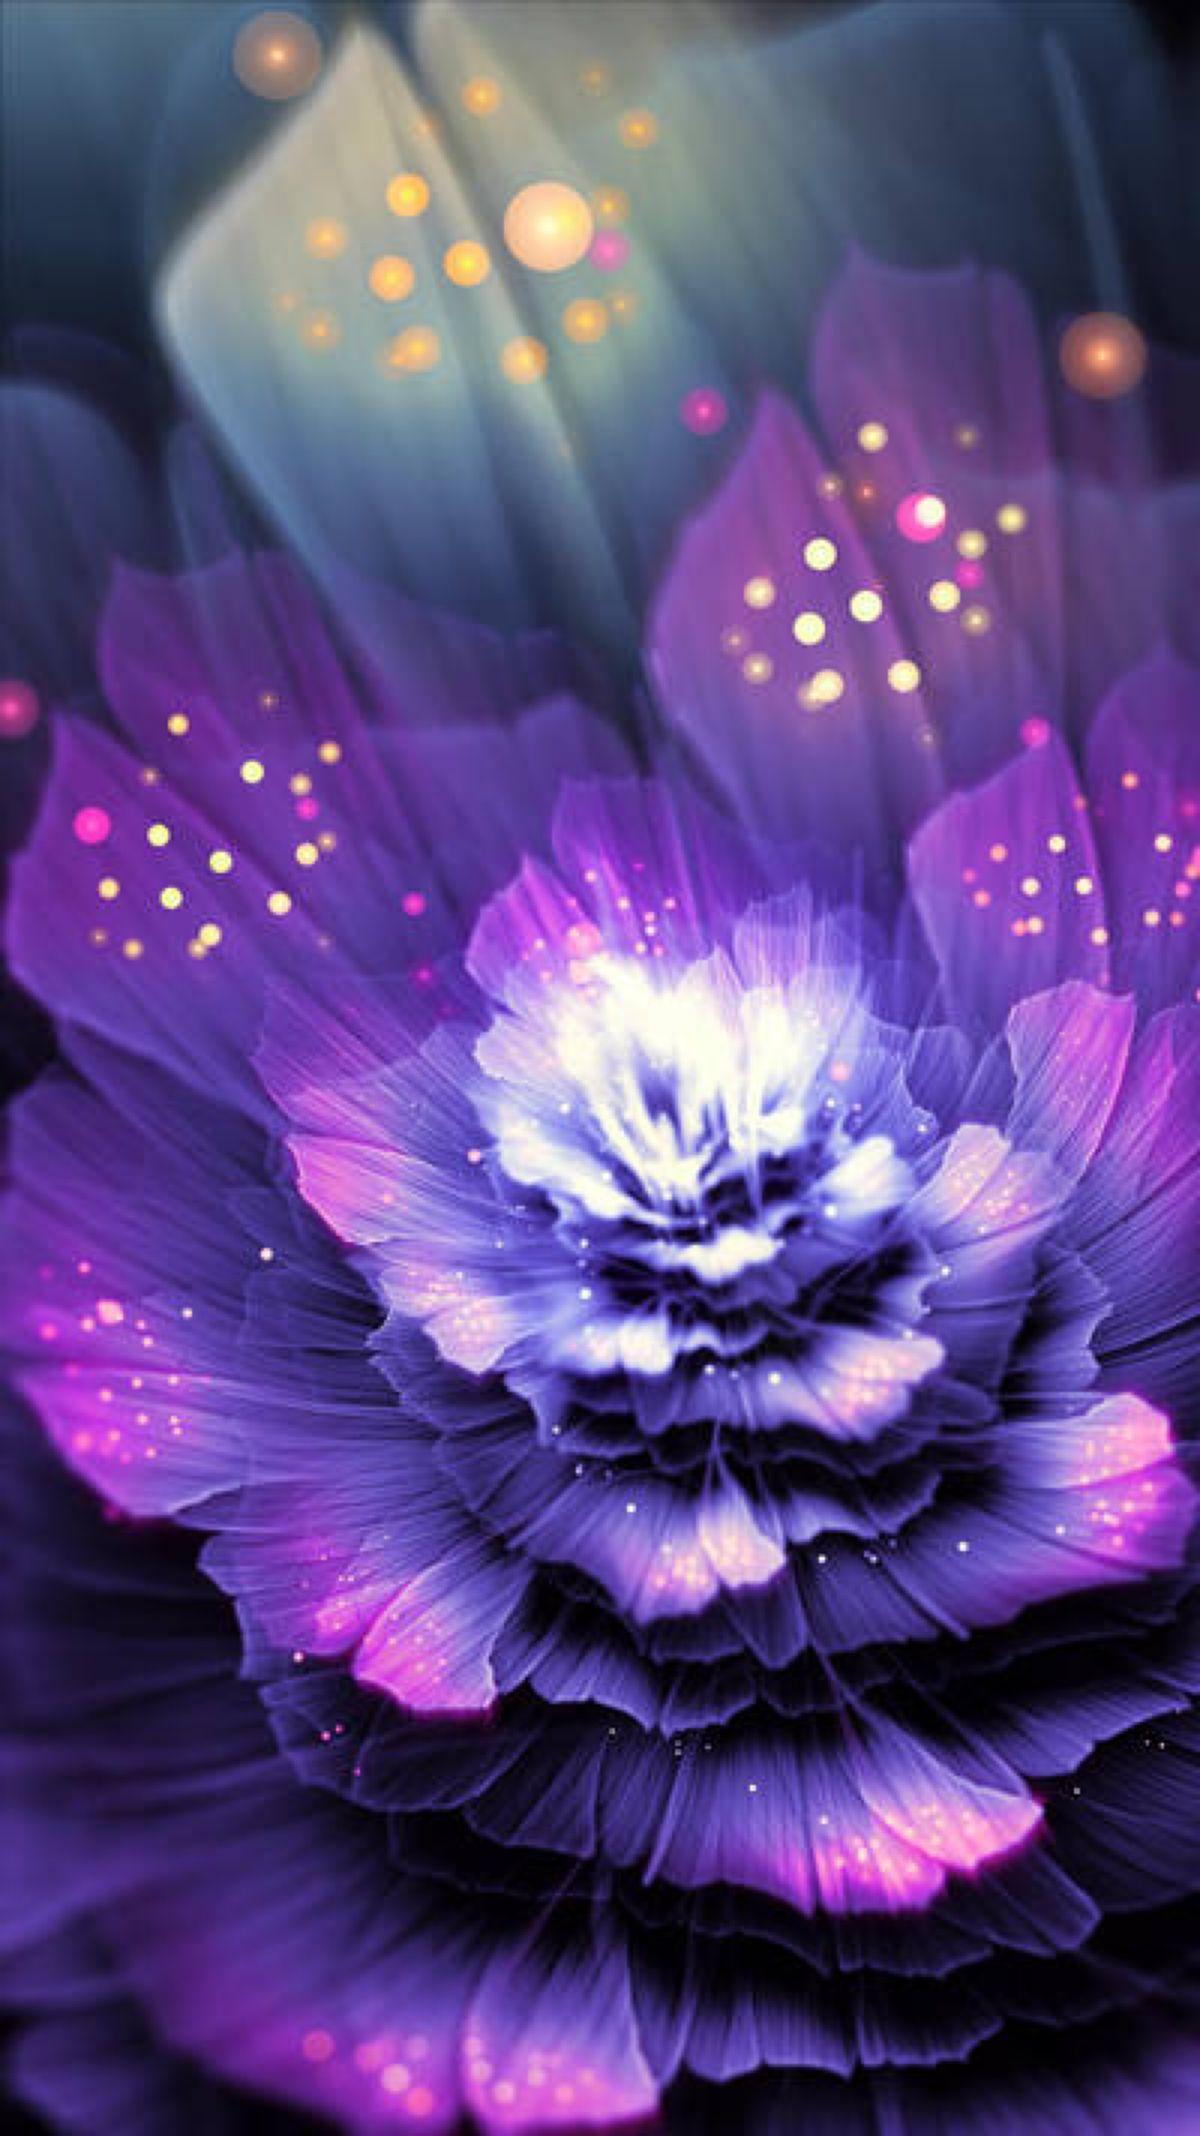 Sweet Love By Fractist On Deviantart Blossoms Art Beautiful Flowers Wallpapers Flower Phone Wallpaper